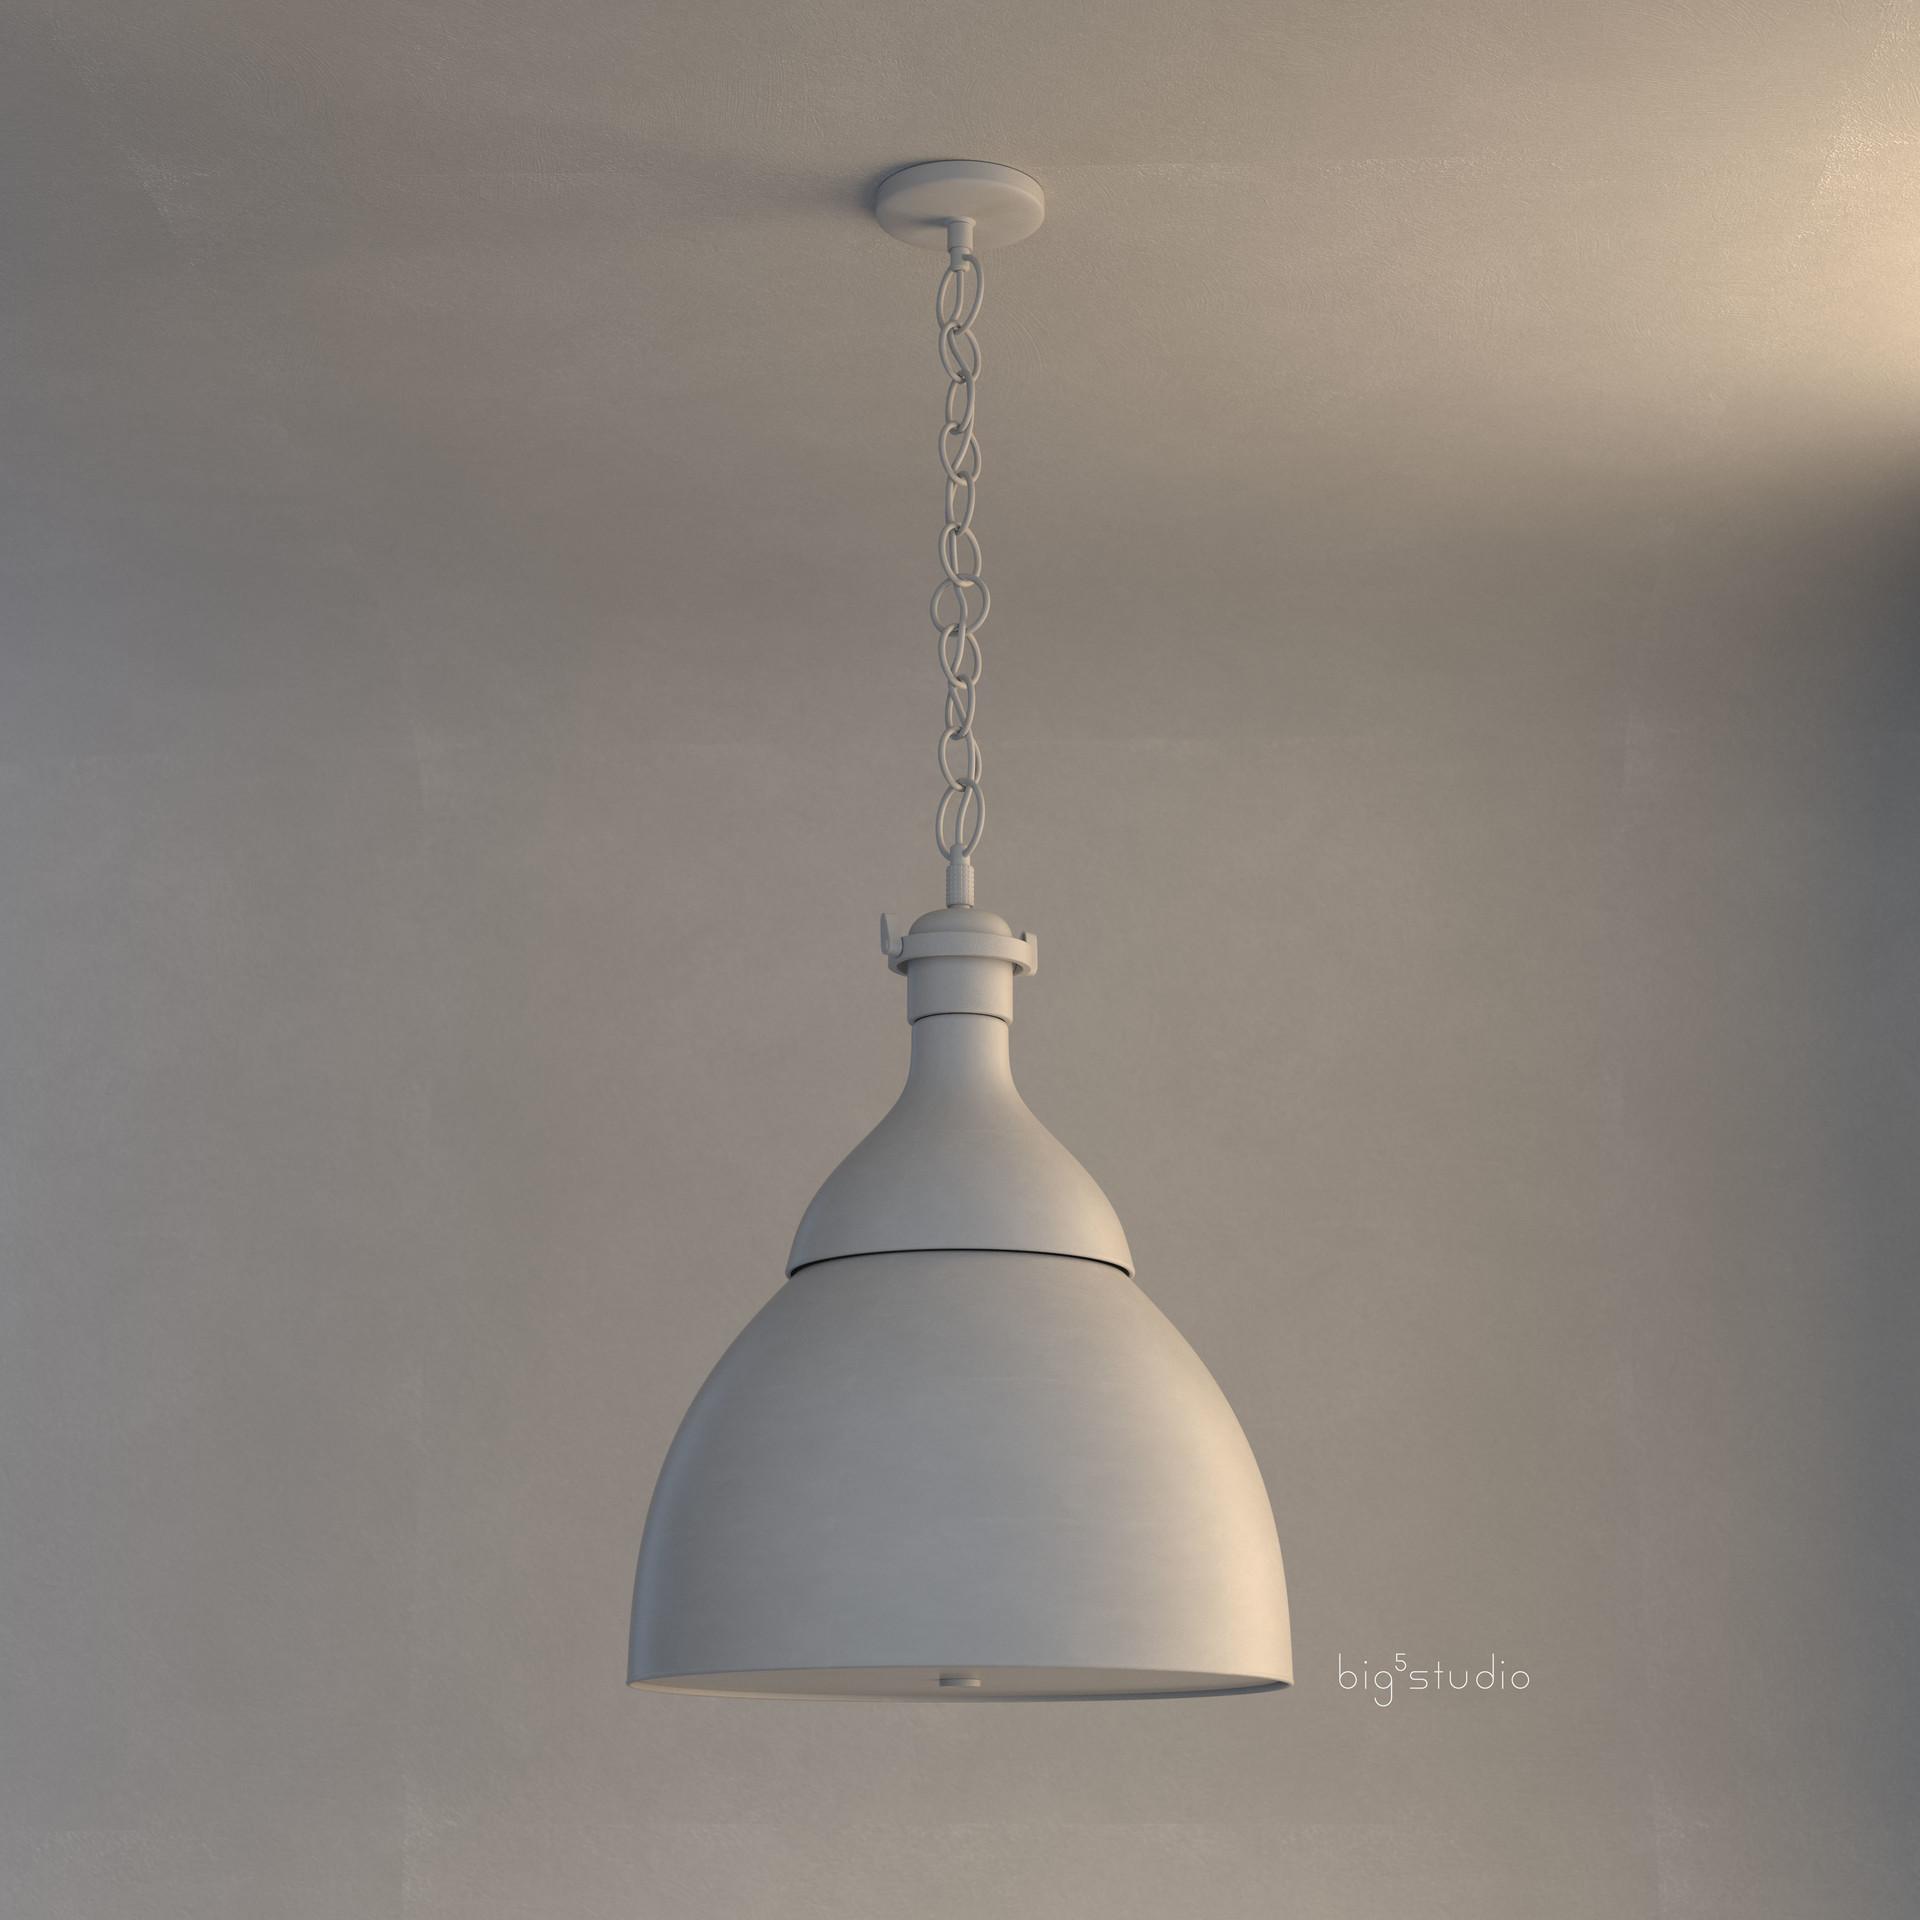 Neal biggs product lightfixture001 clay